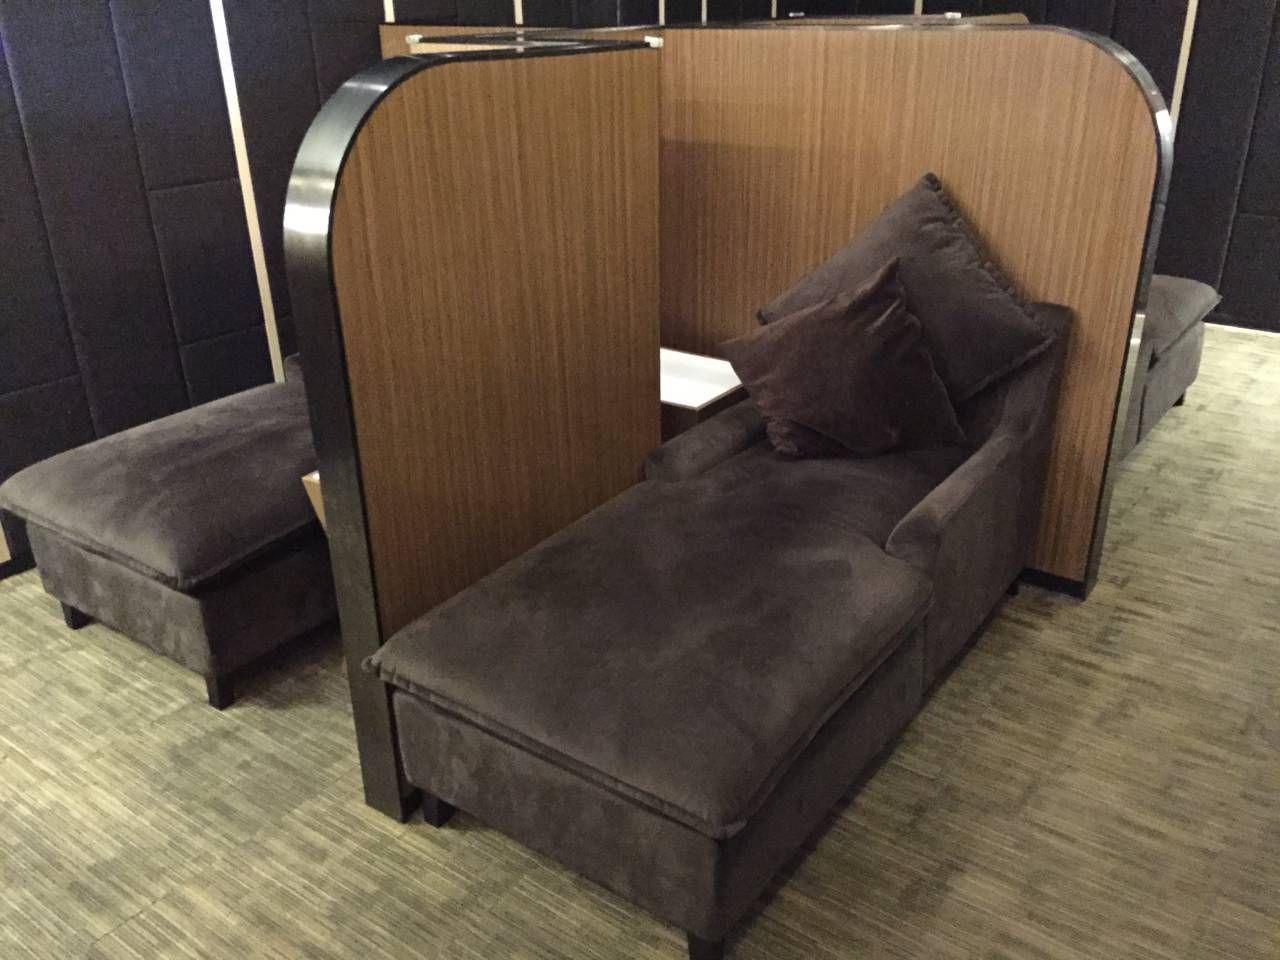 Plaza Premium Lounge HKG - 4